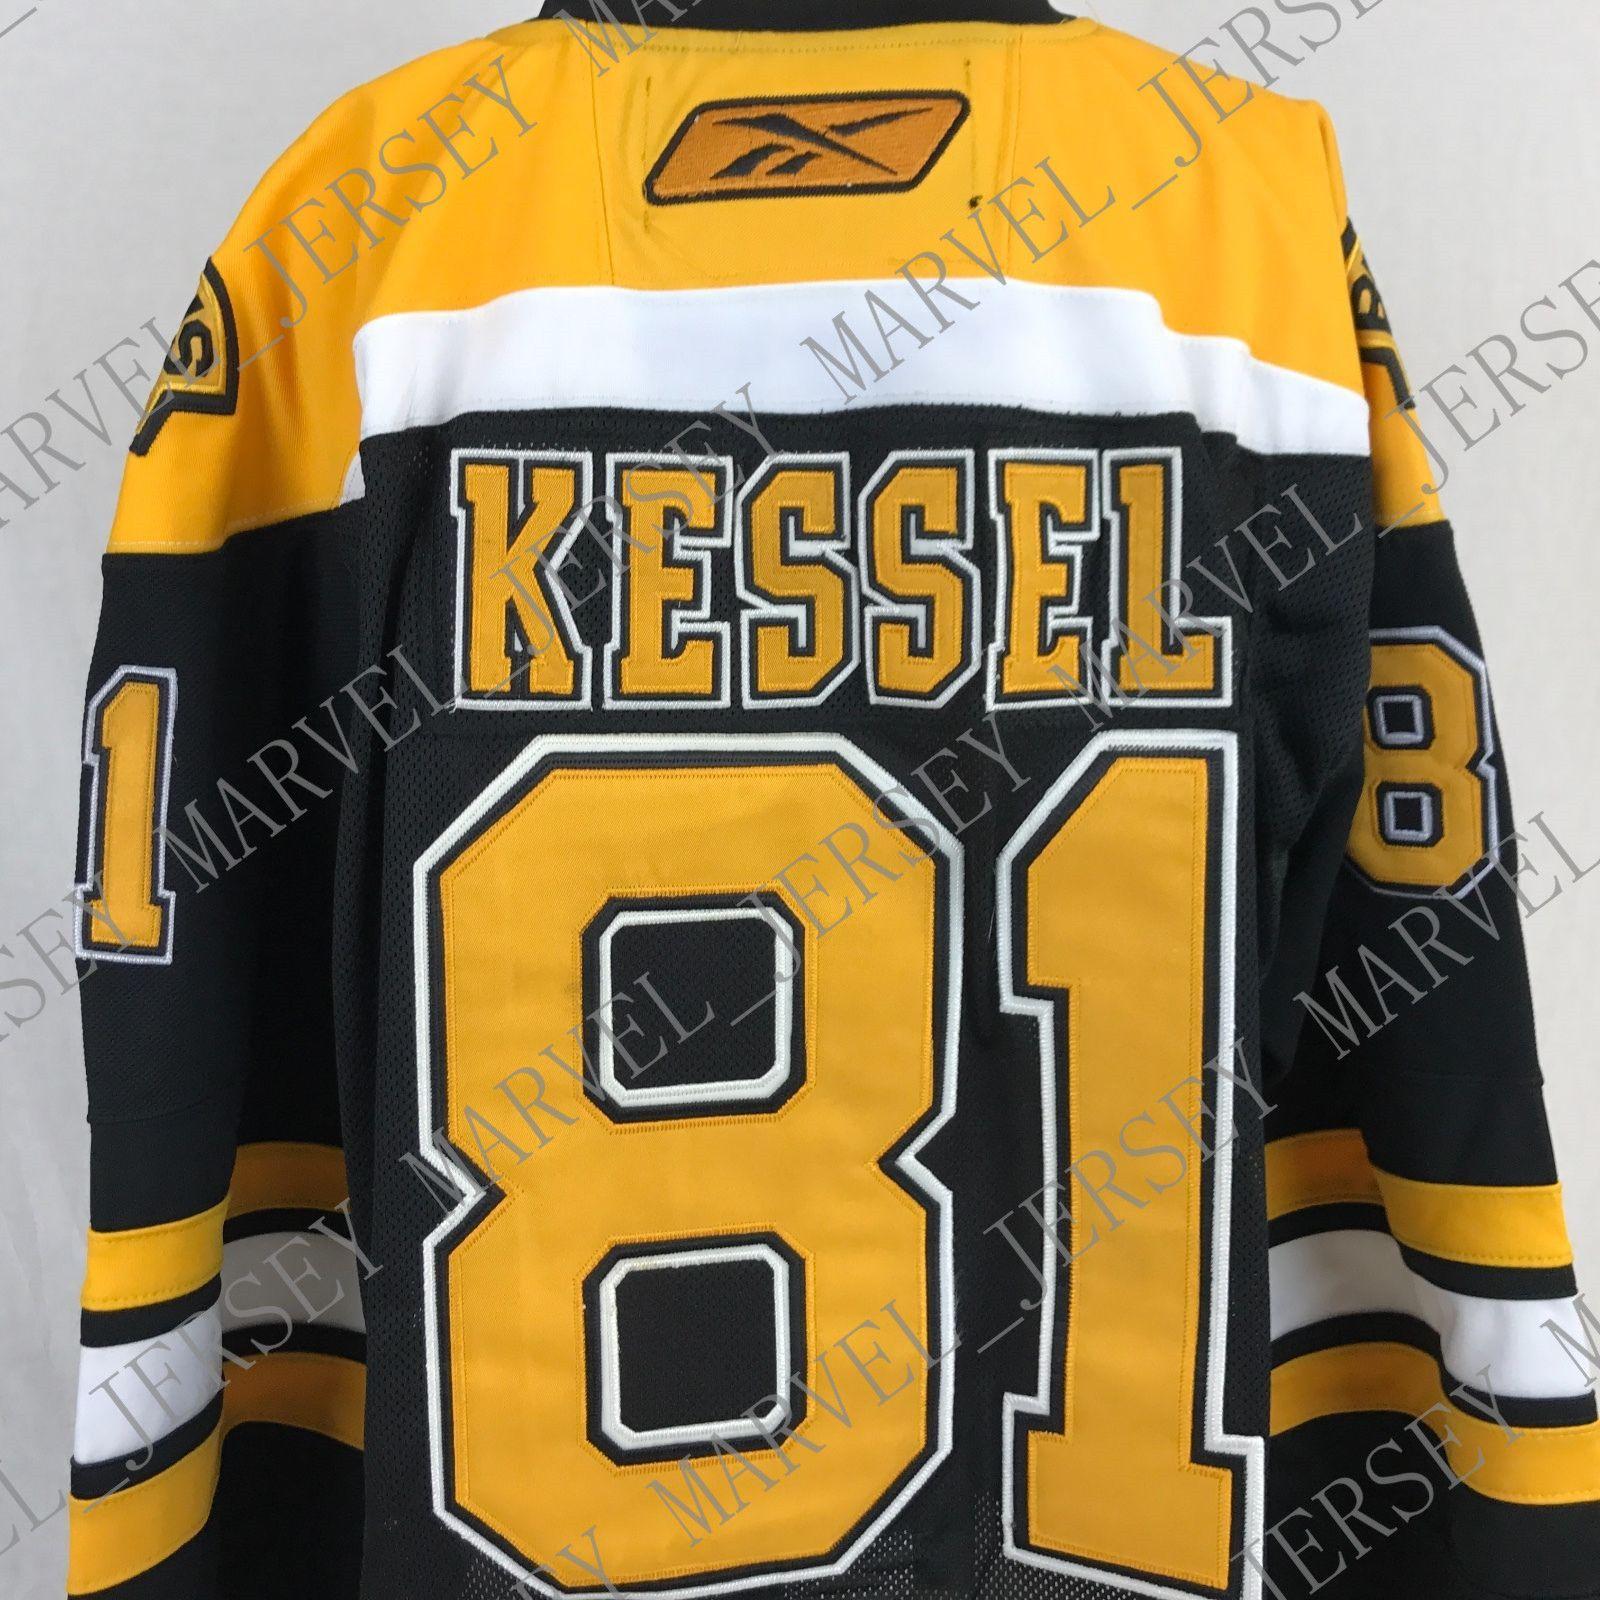 detailing 25fbd c7fce Cheap custom NEW CCM Edge Phil Kessel Boston Bruins Jersey Mens  Personalized stitching jerseys